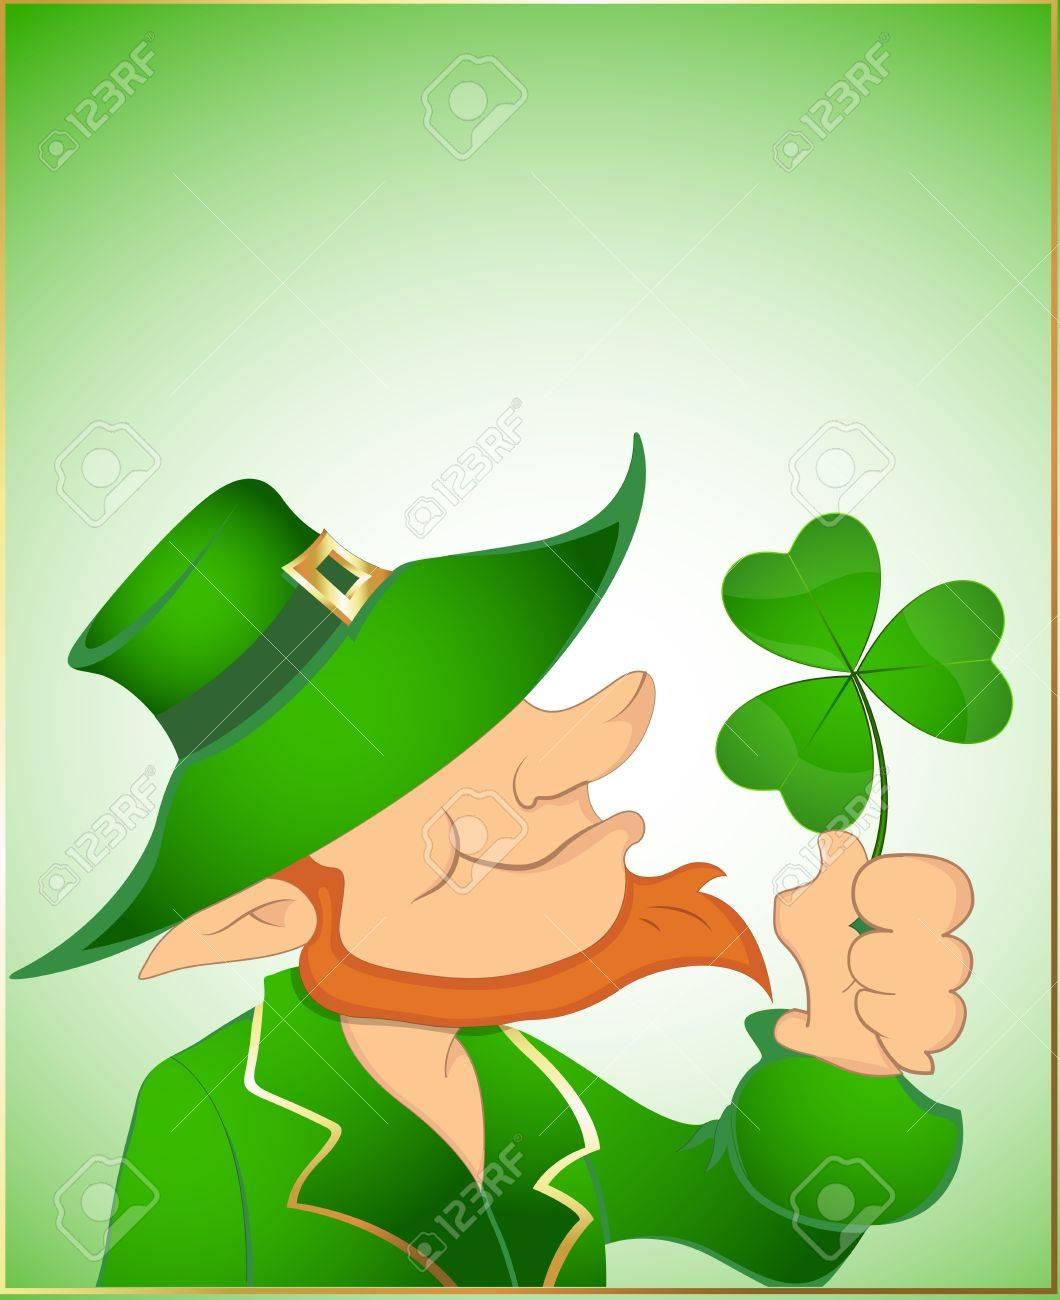 Illustration of Leprechaun with Shamrock Stock Vector - 12654789